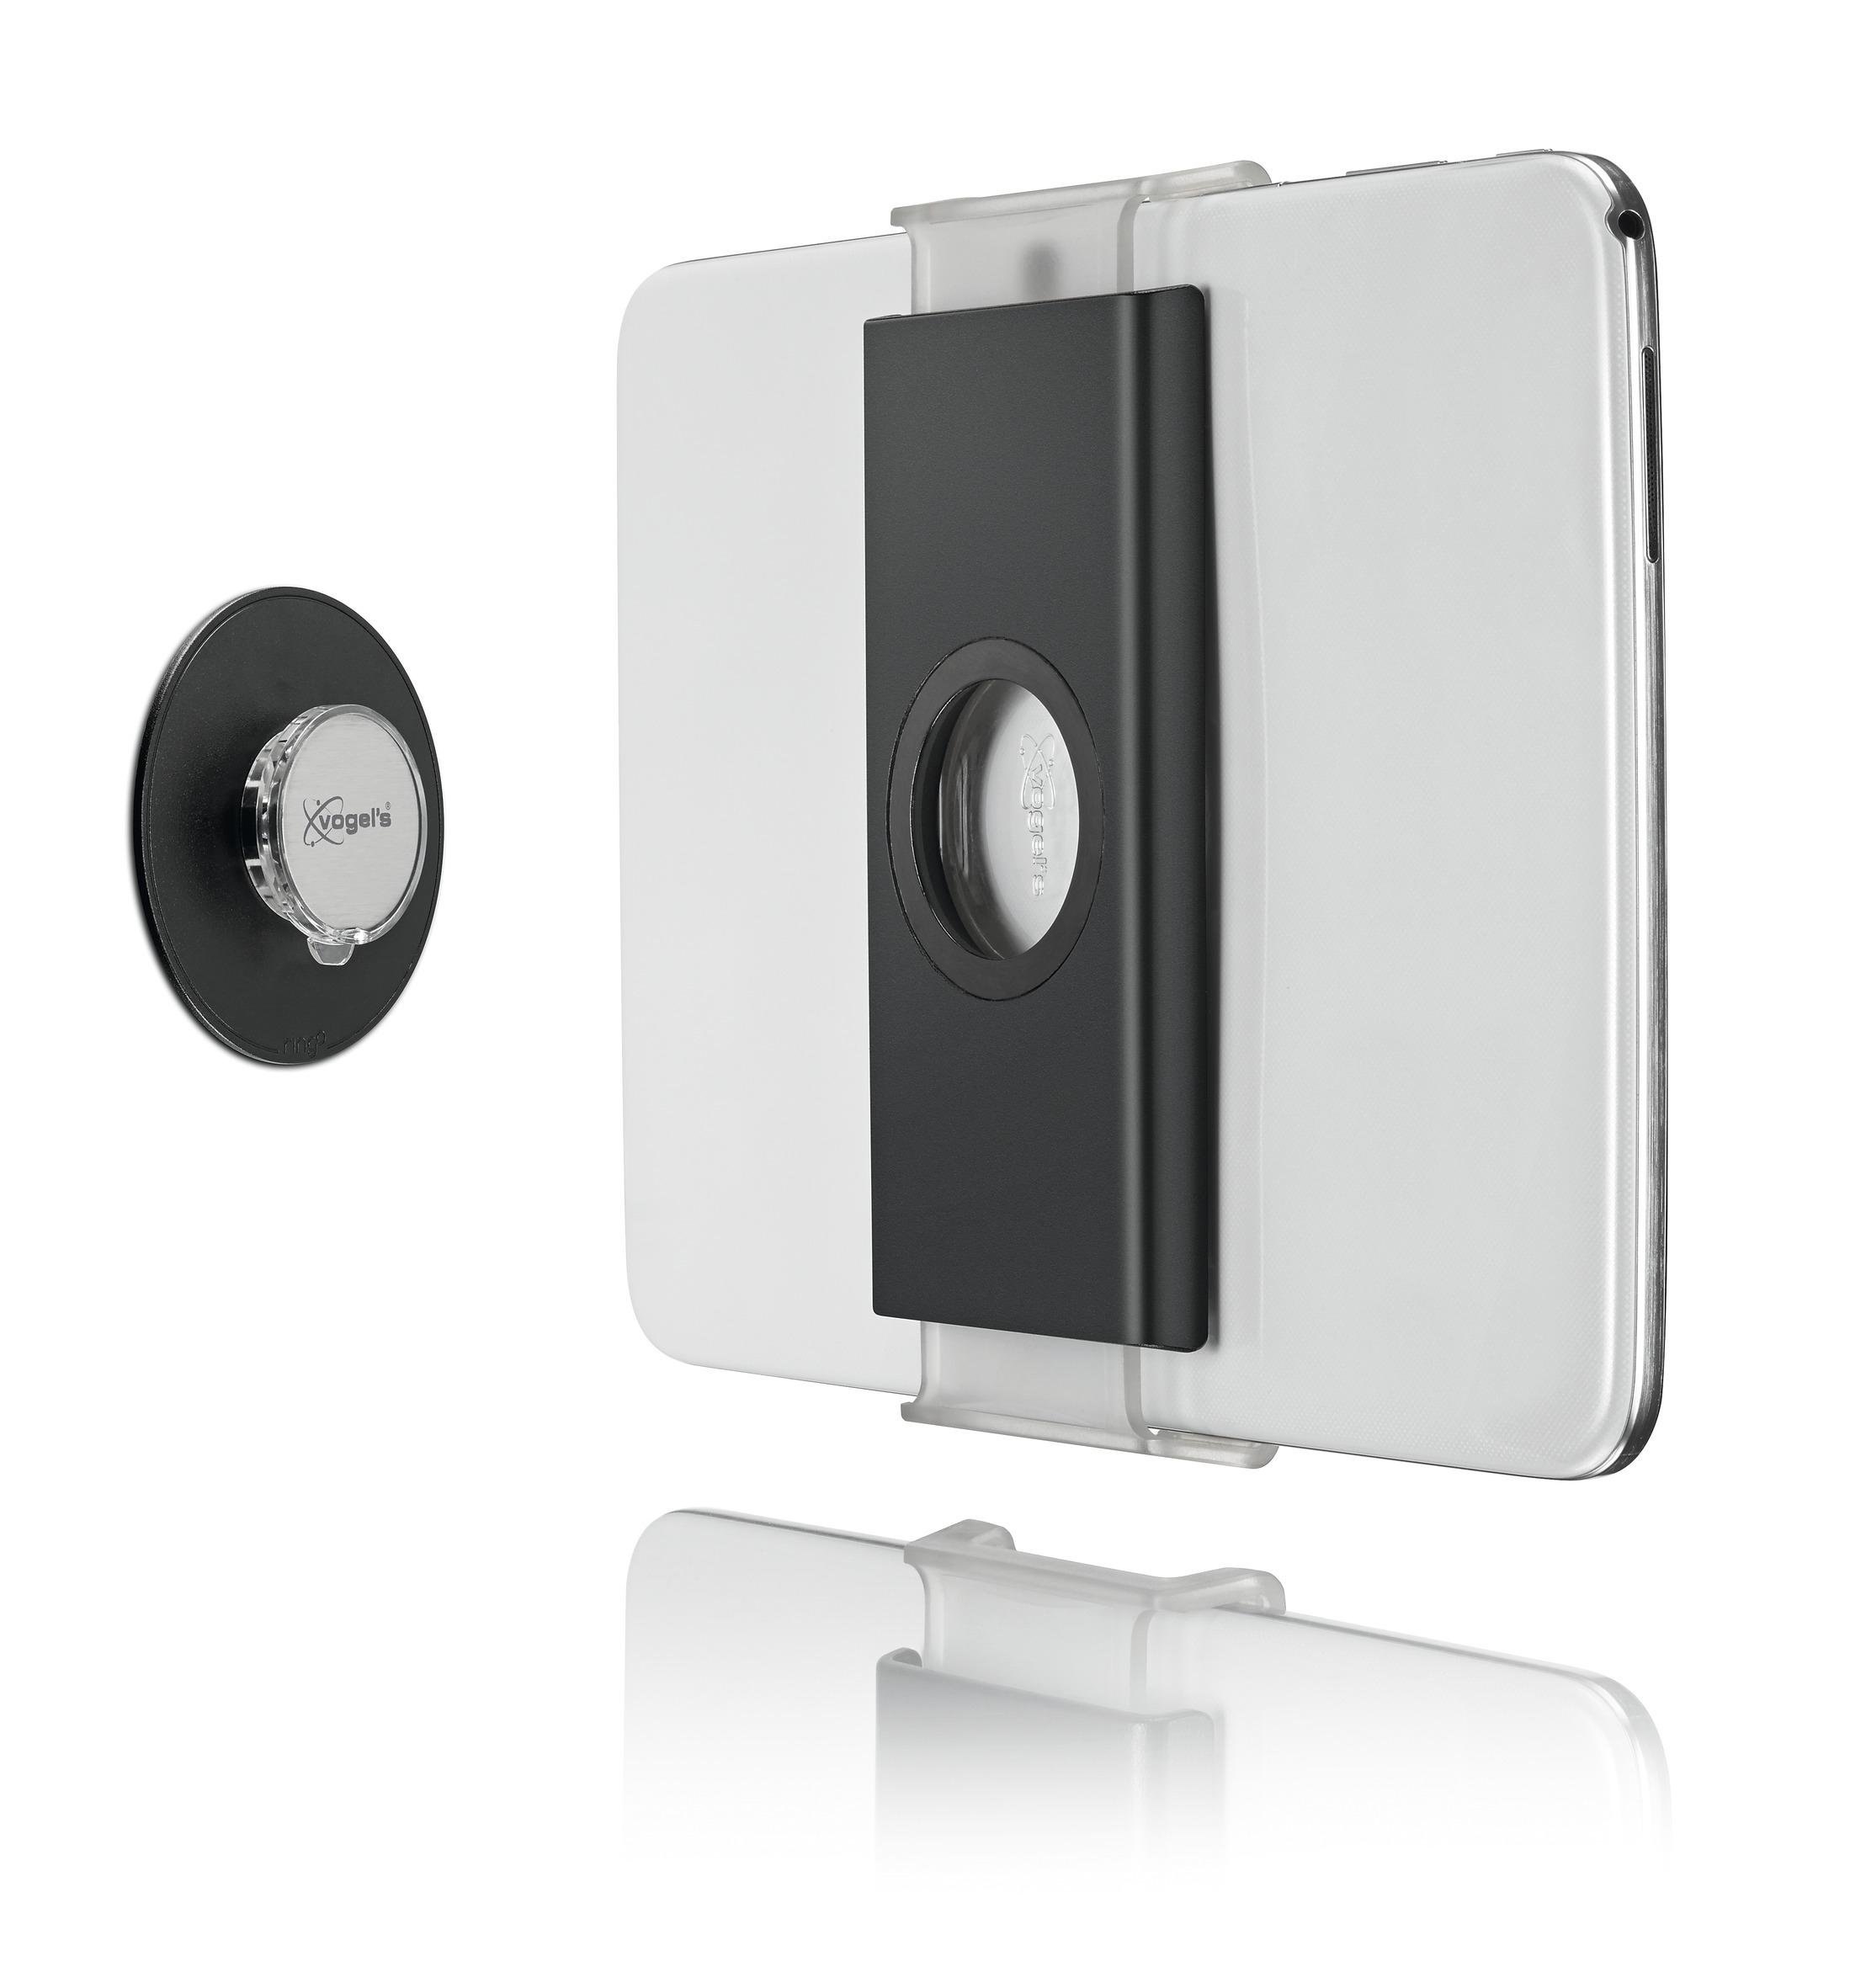 Vogel's TMS 1010 Black holder